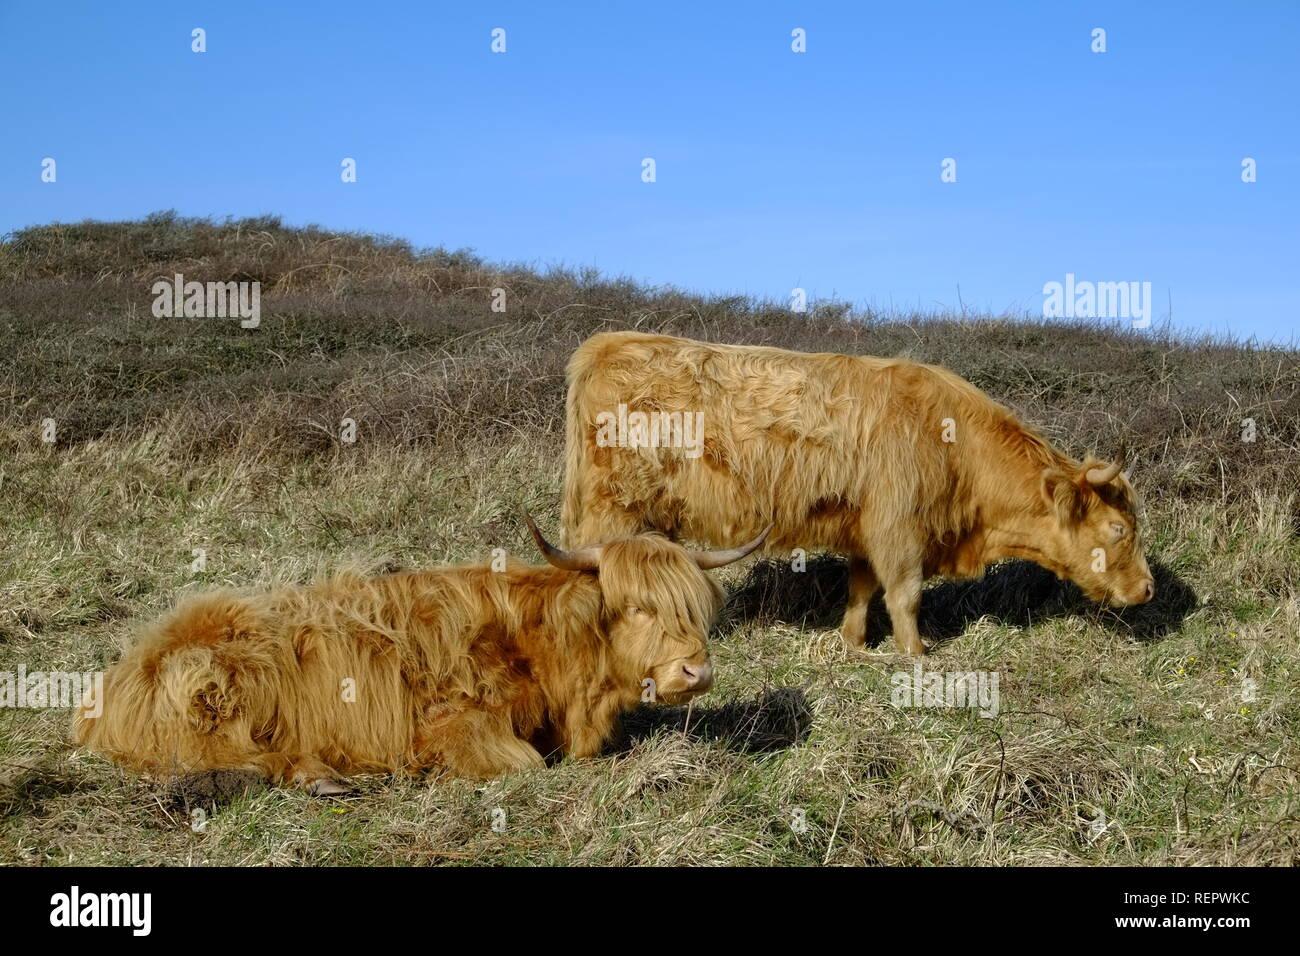 Highland cattle (Bos taurus) sleeping or grazing on National Trust coastal land. Bolberry Down, South Hams, Devon. UK - Stock Image